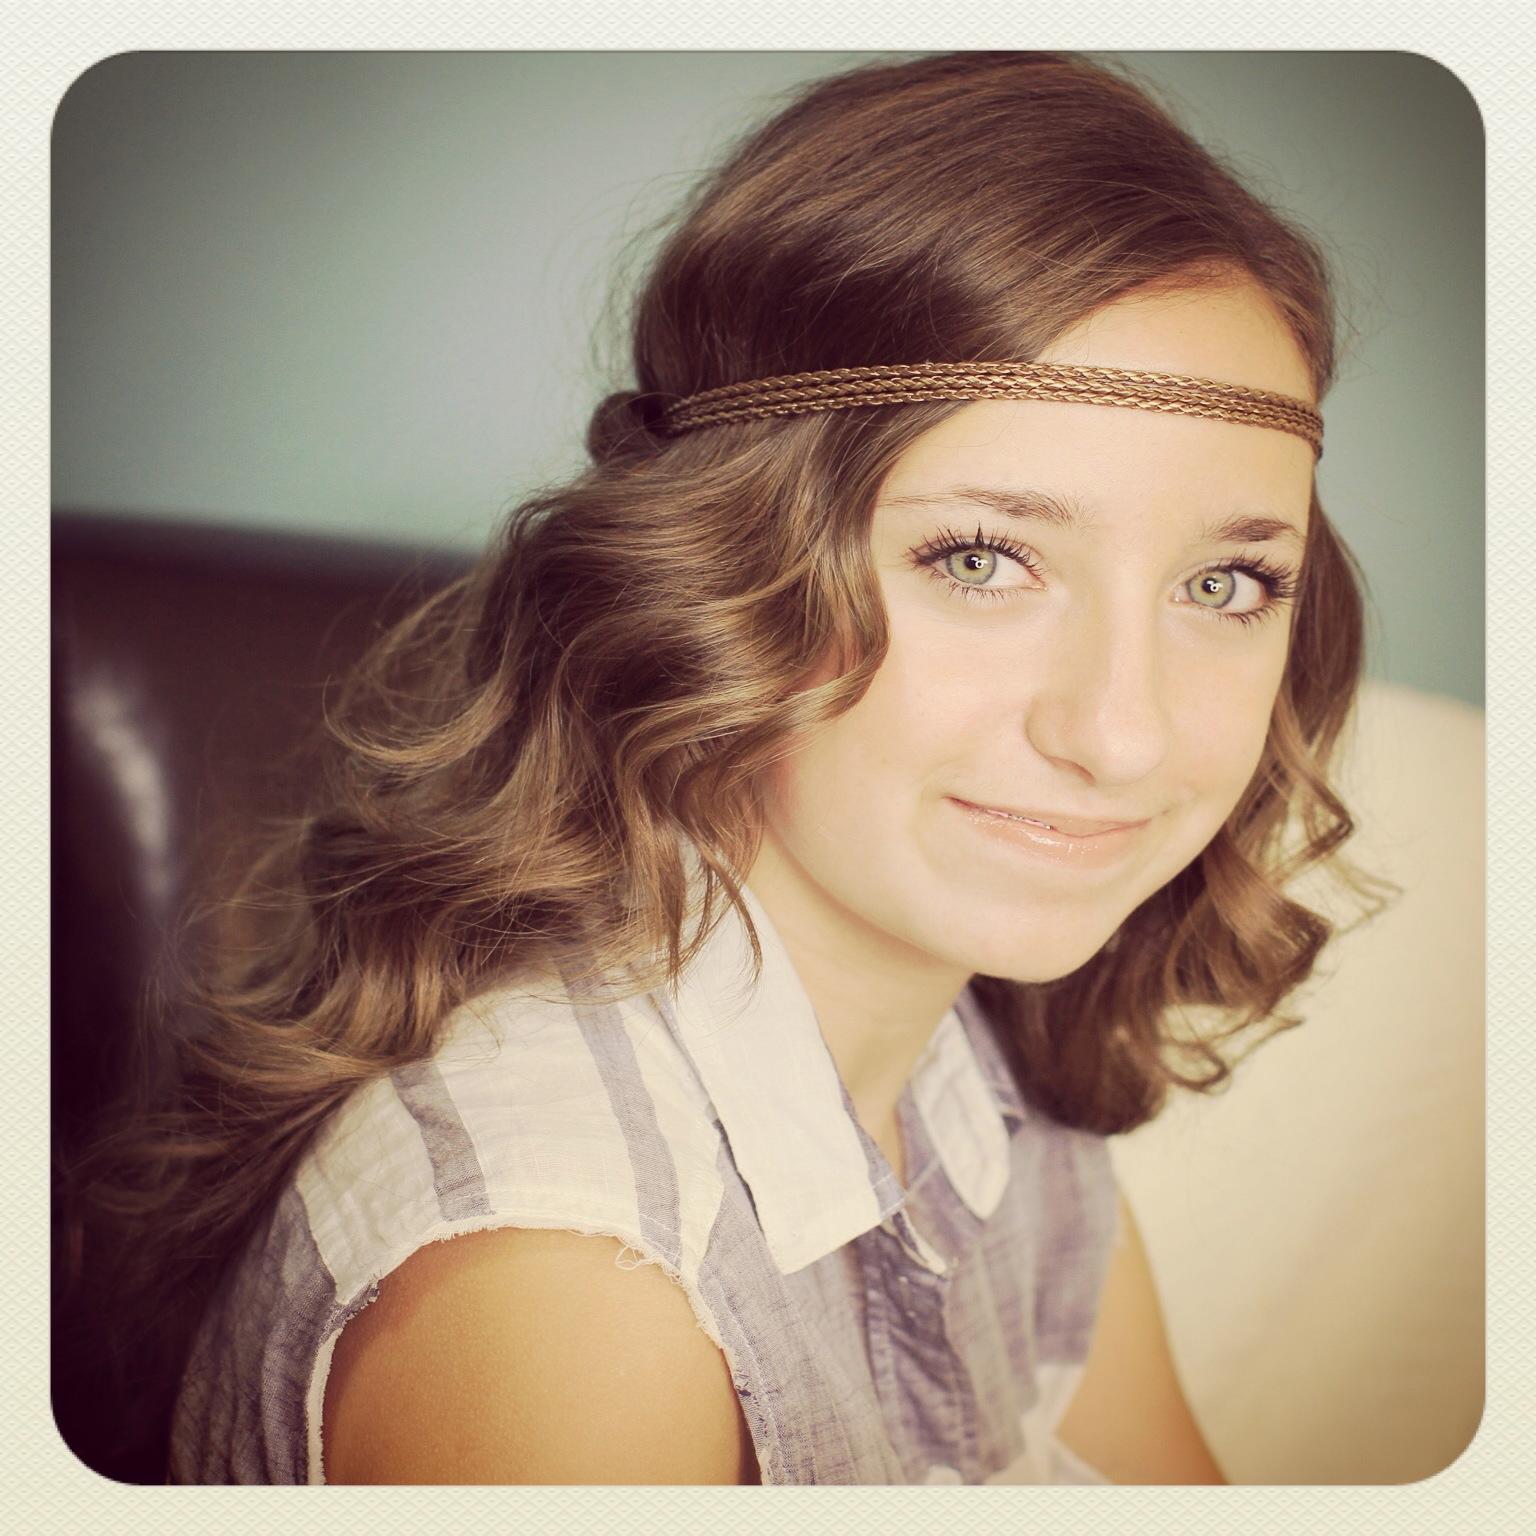 headband-twist-half-up-half-down-hairstyles-cute-girls-hairstyles-for-headband-hairstyles-v-cut-and-u-cut-hairstyles